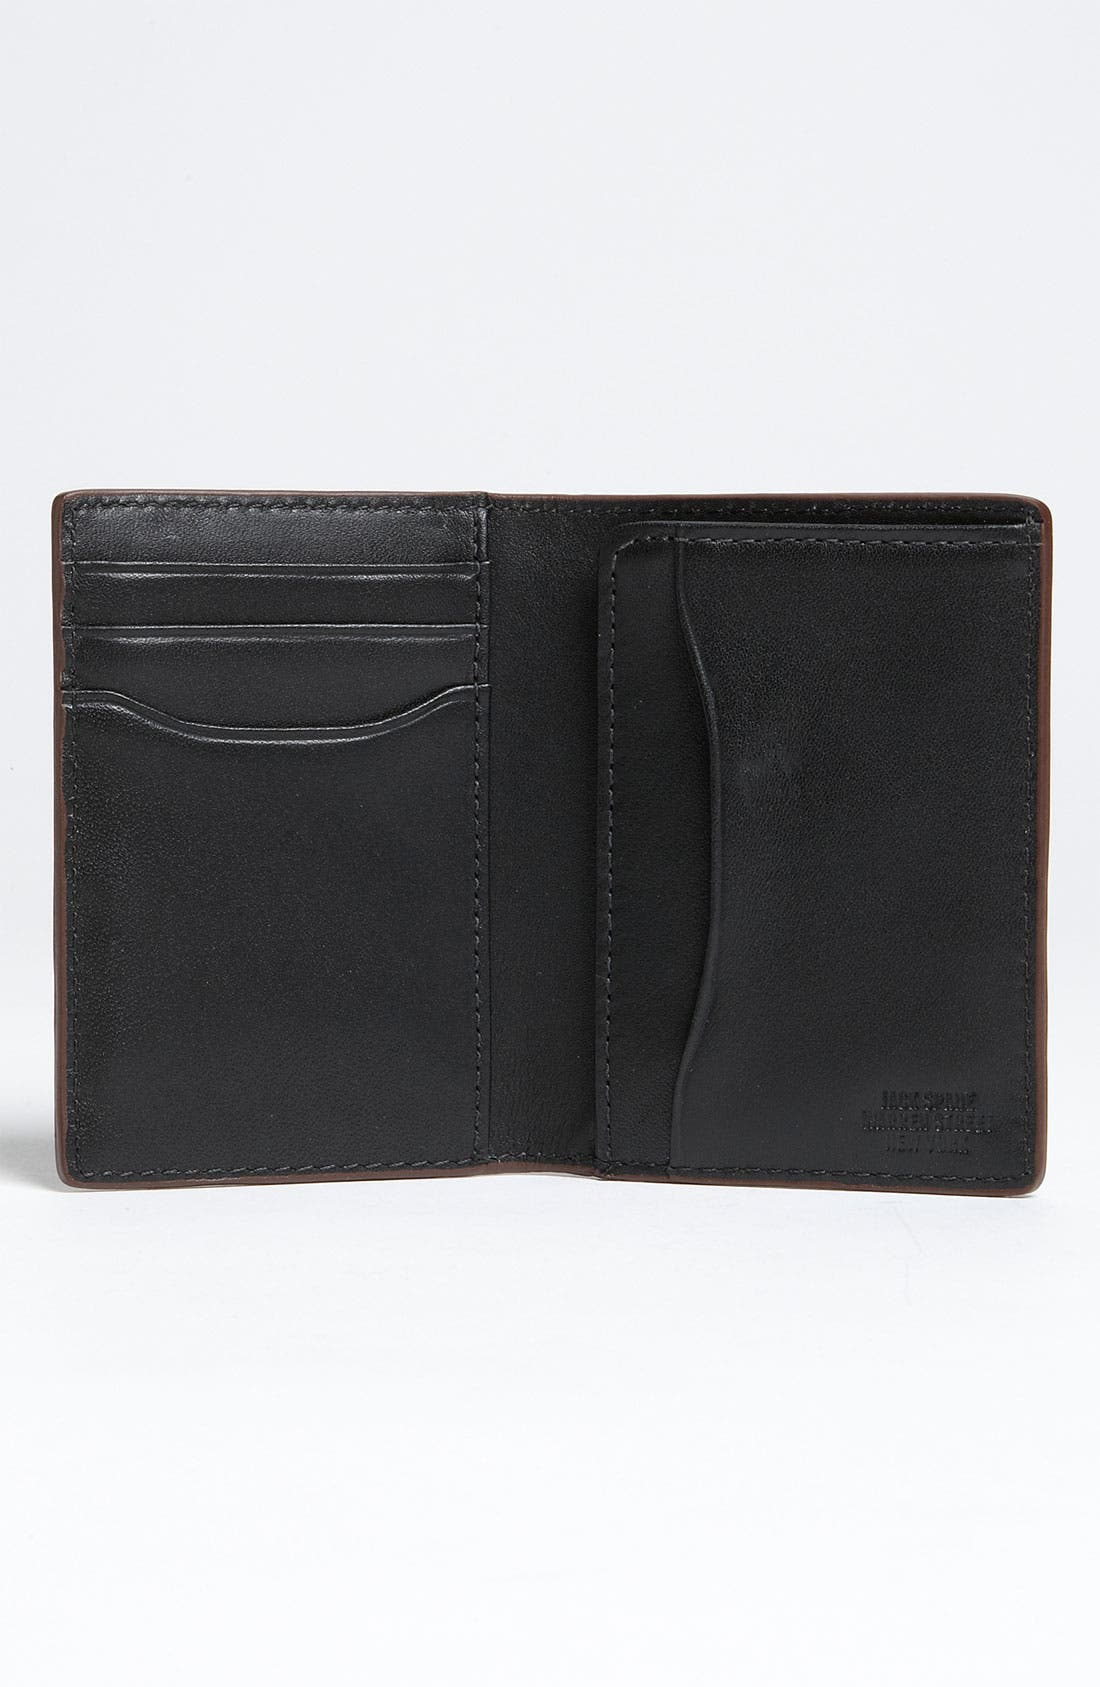 Alternate Image 2  - Jack Spade 'Vertical Flap' Mill Leather Wallet